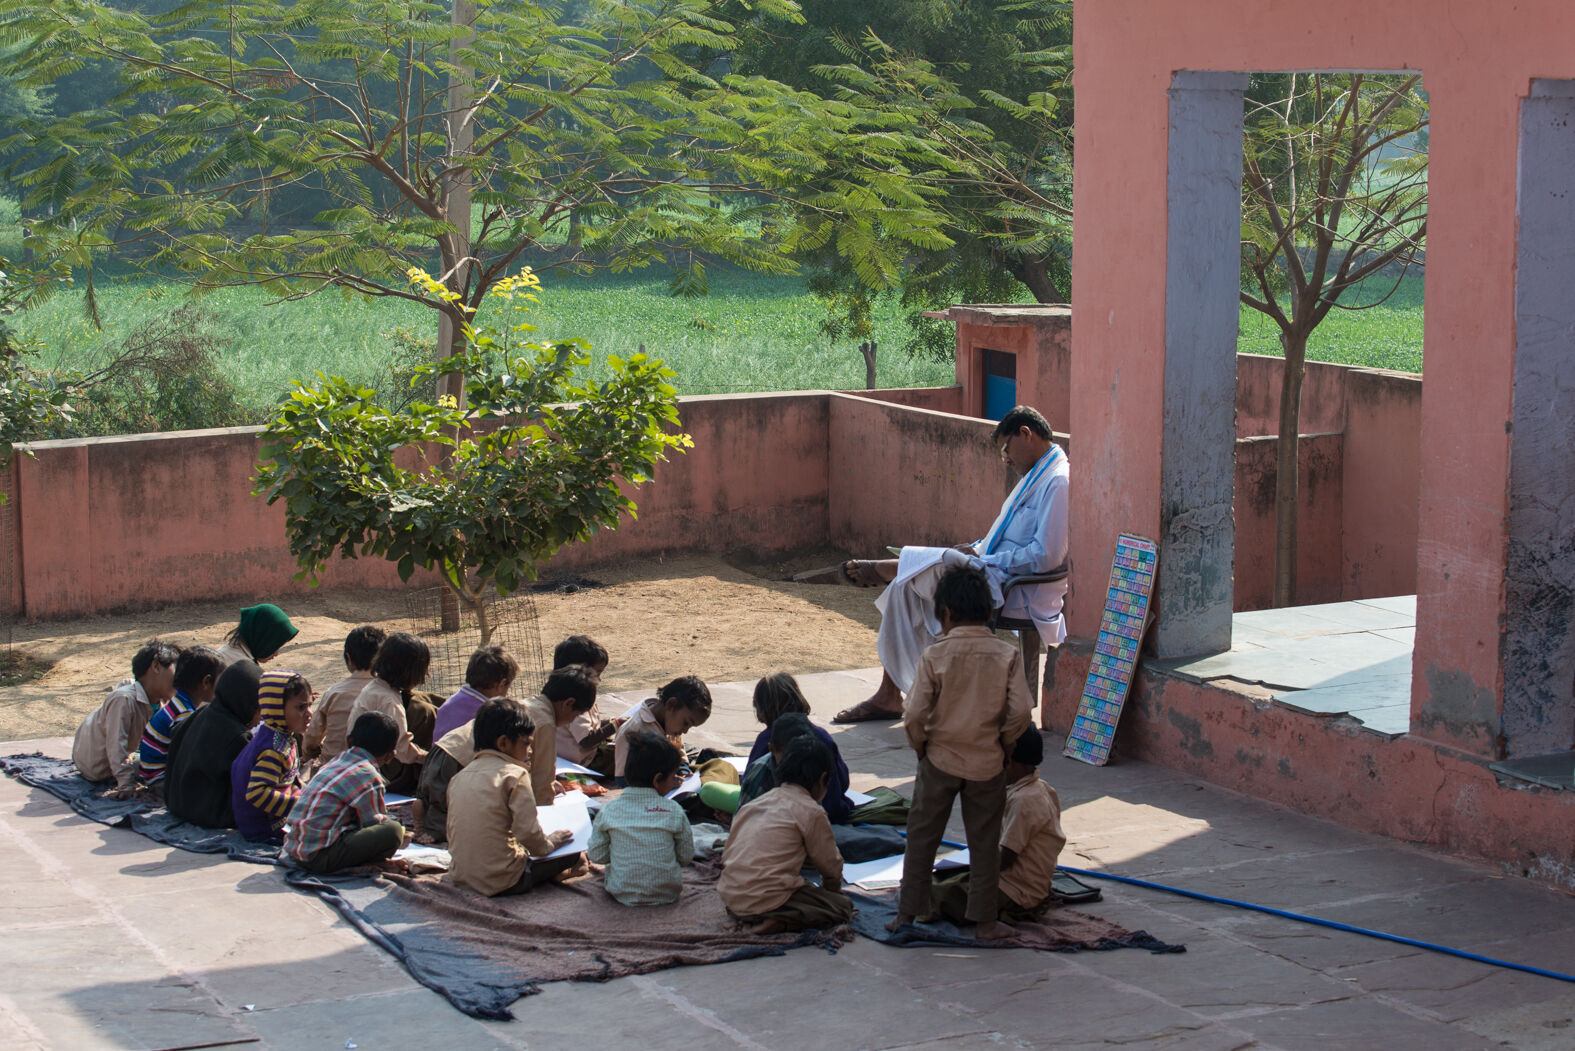 Ramathra, Rajasthan, January 2018